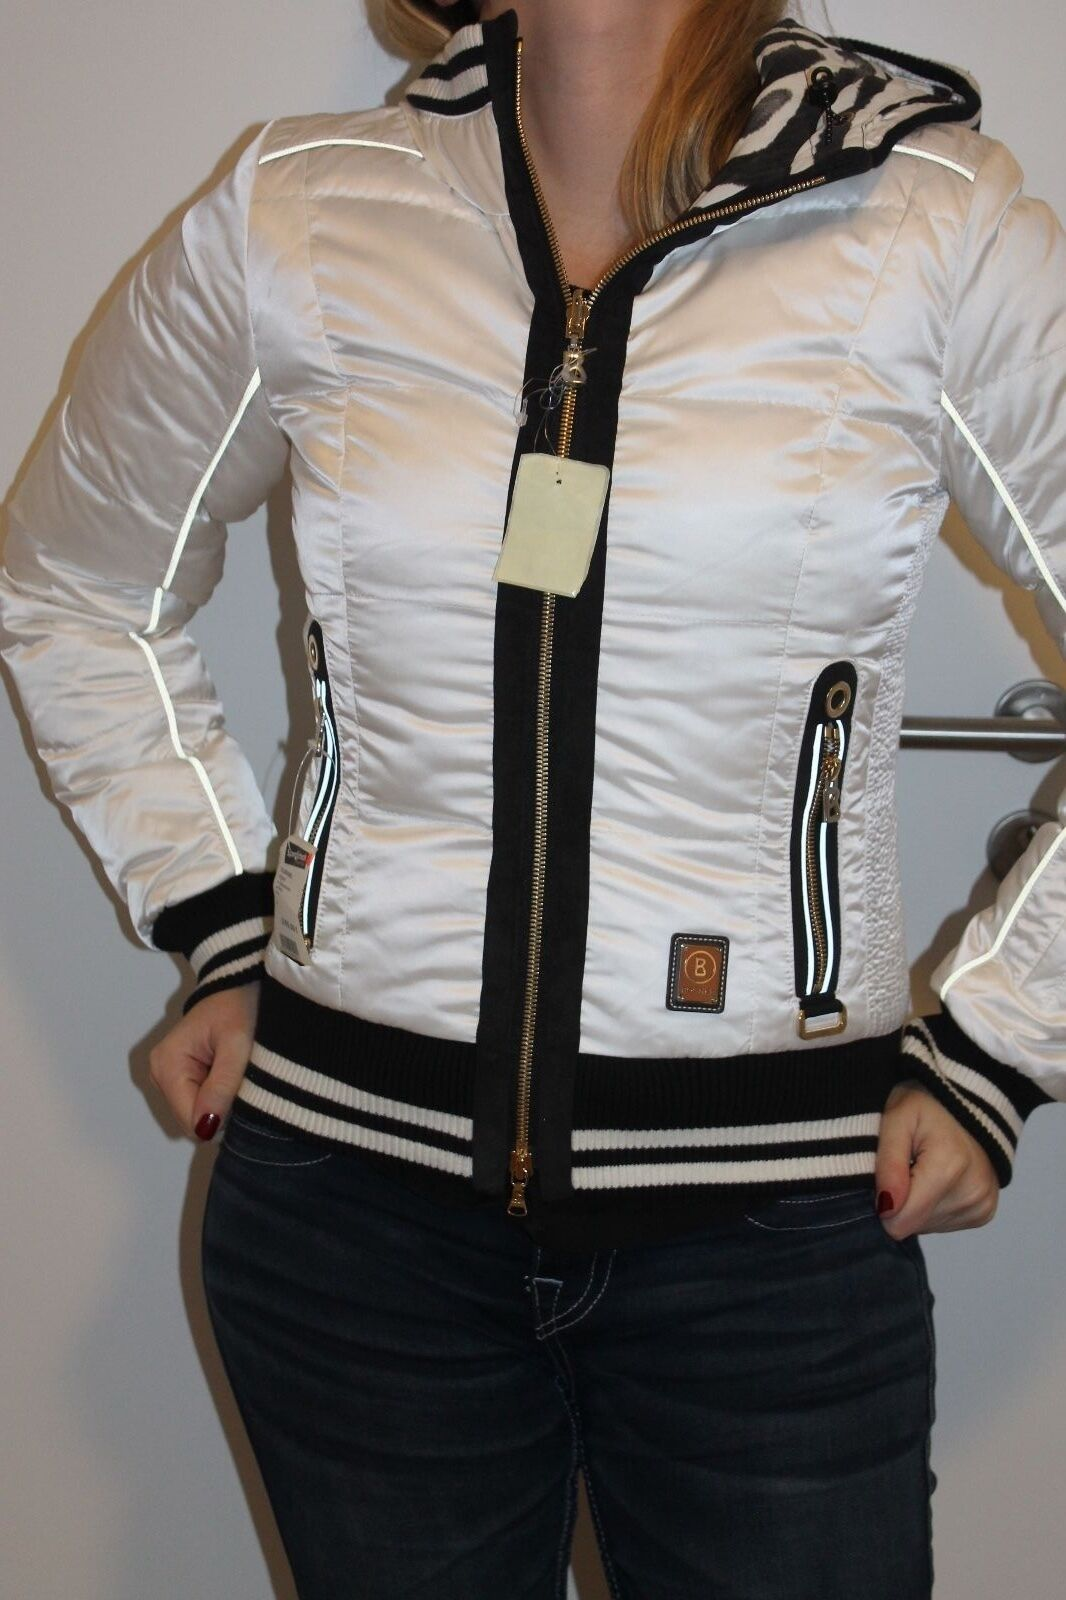 BOGNER DONNA SCI reversibile giacca blu bianco nero taglia 34 XS